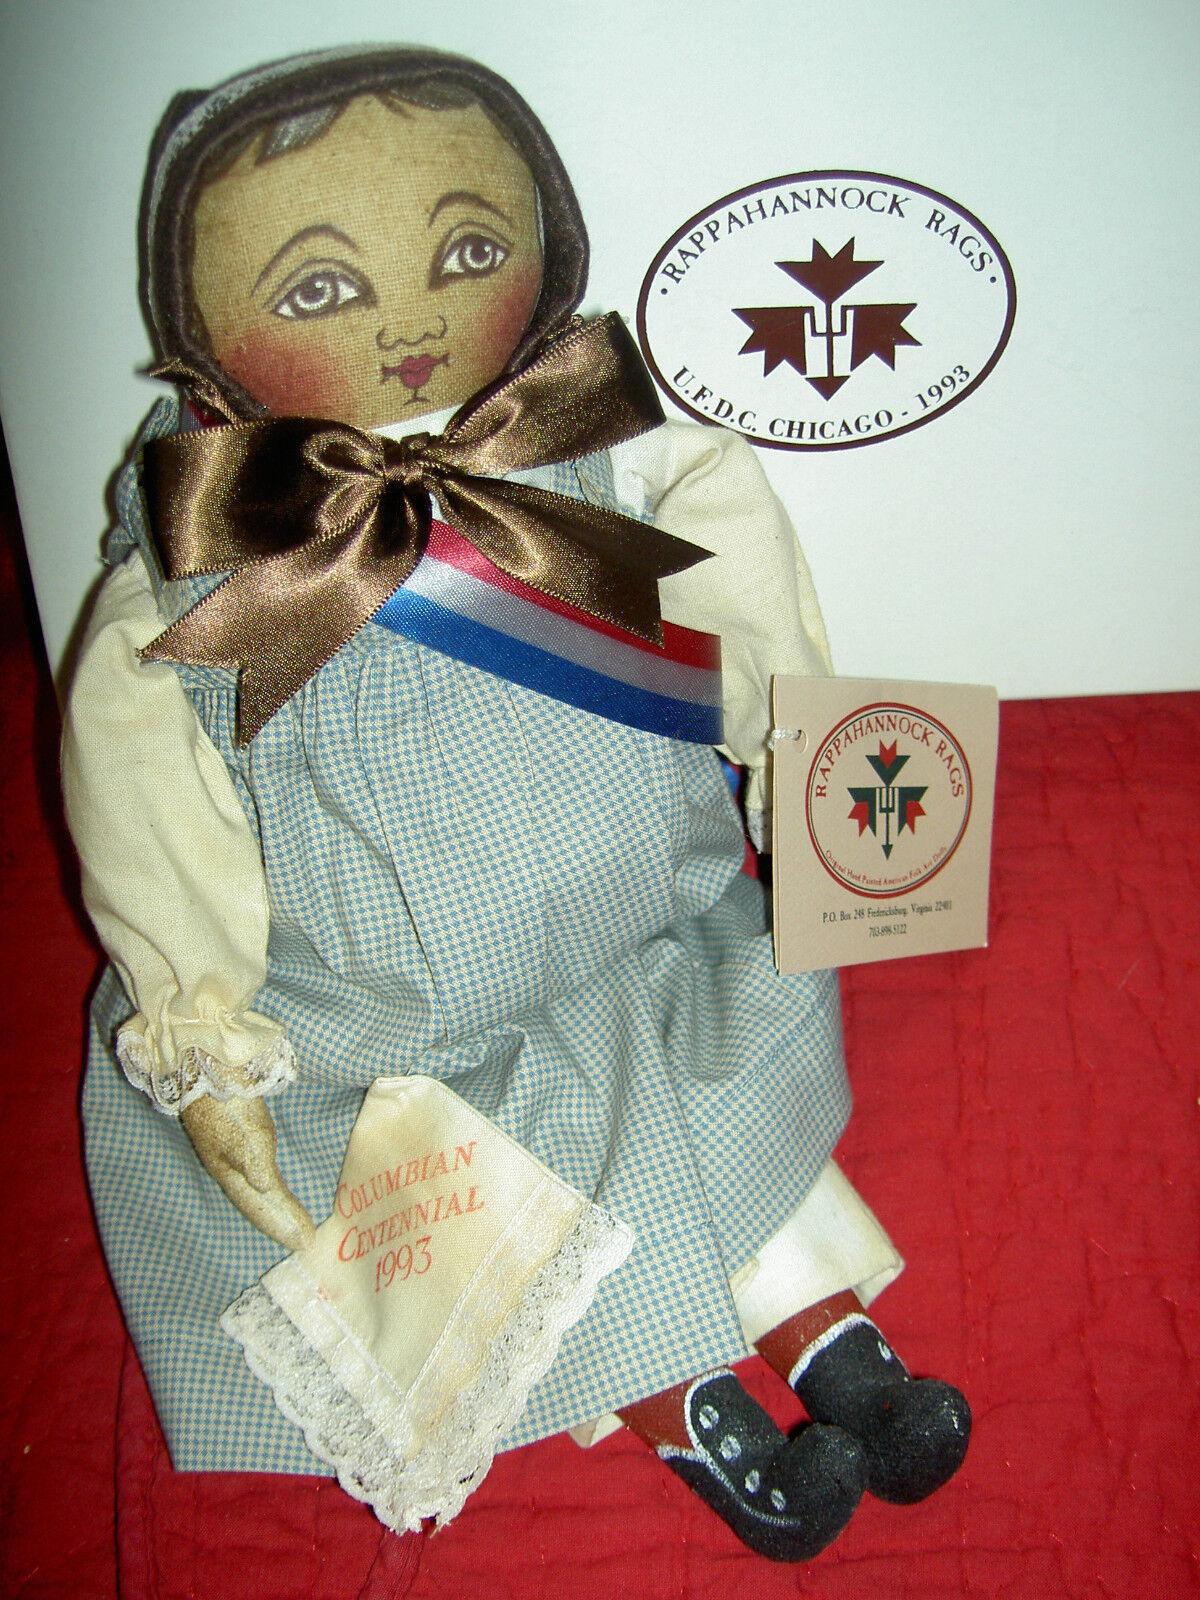 EMMA, Columbian Centennial 1993, UFDC 14  sgnd. cloth doll MIB Rappahannock Rags